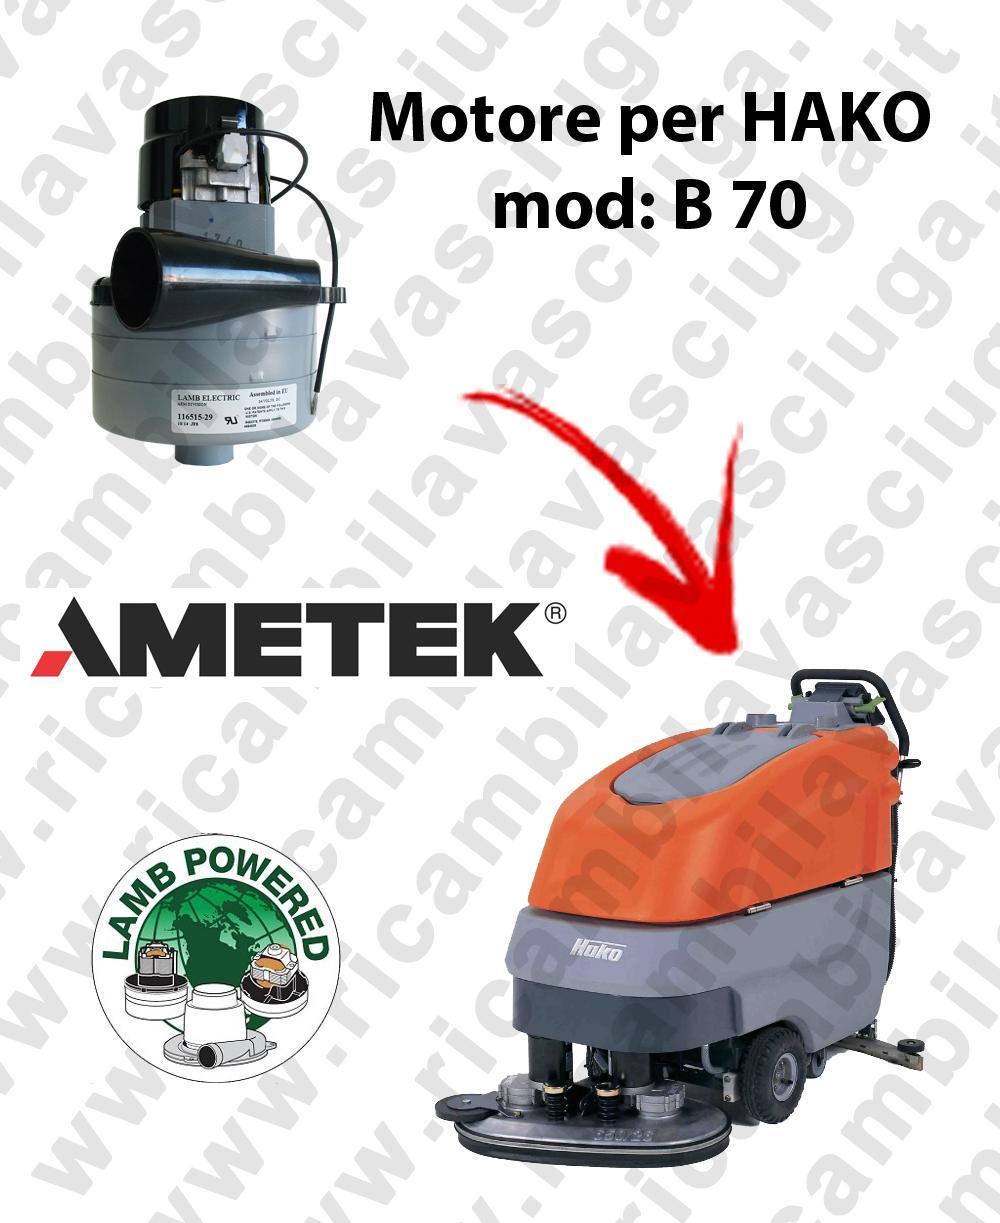 B 70 Motore de aspiración LAMB AMETEK para fregadora HAKO